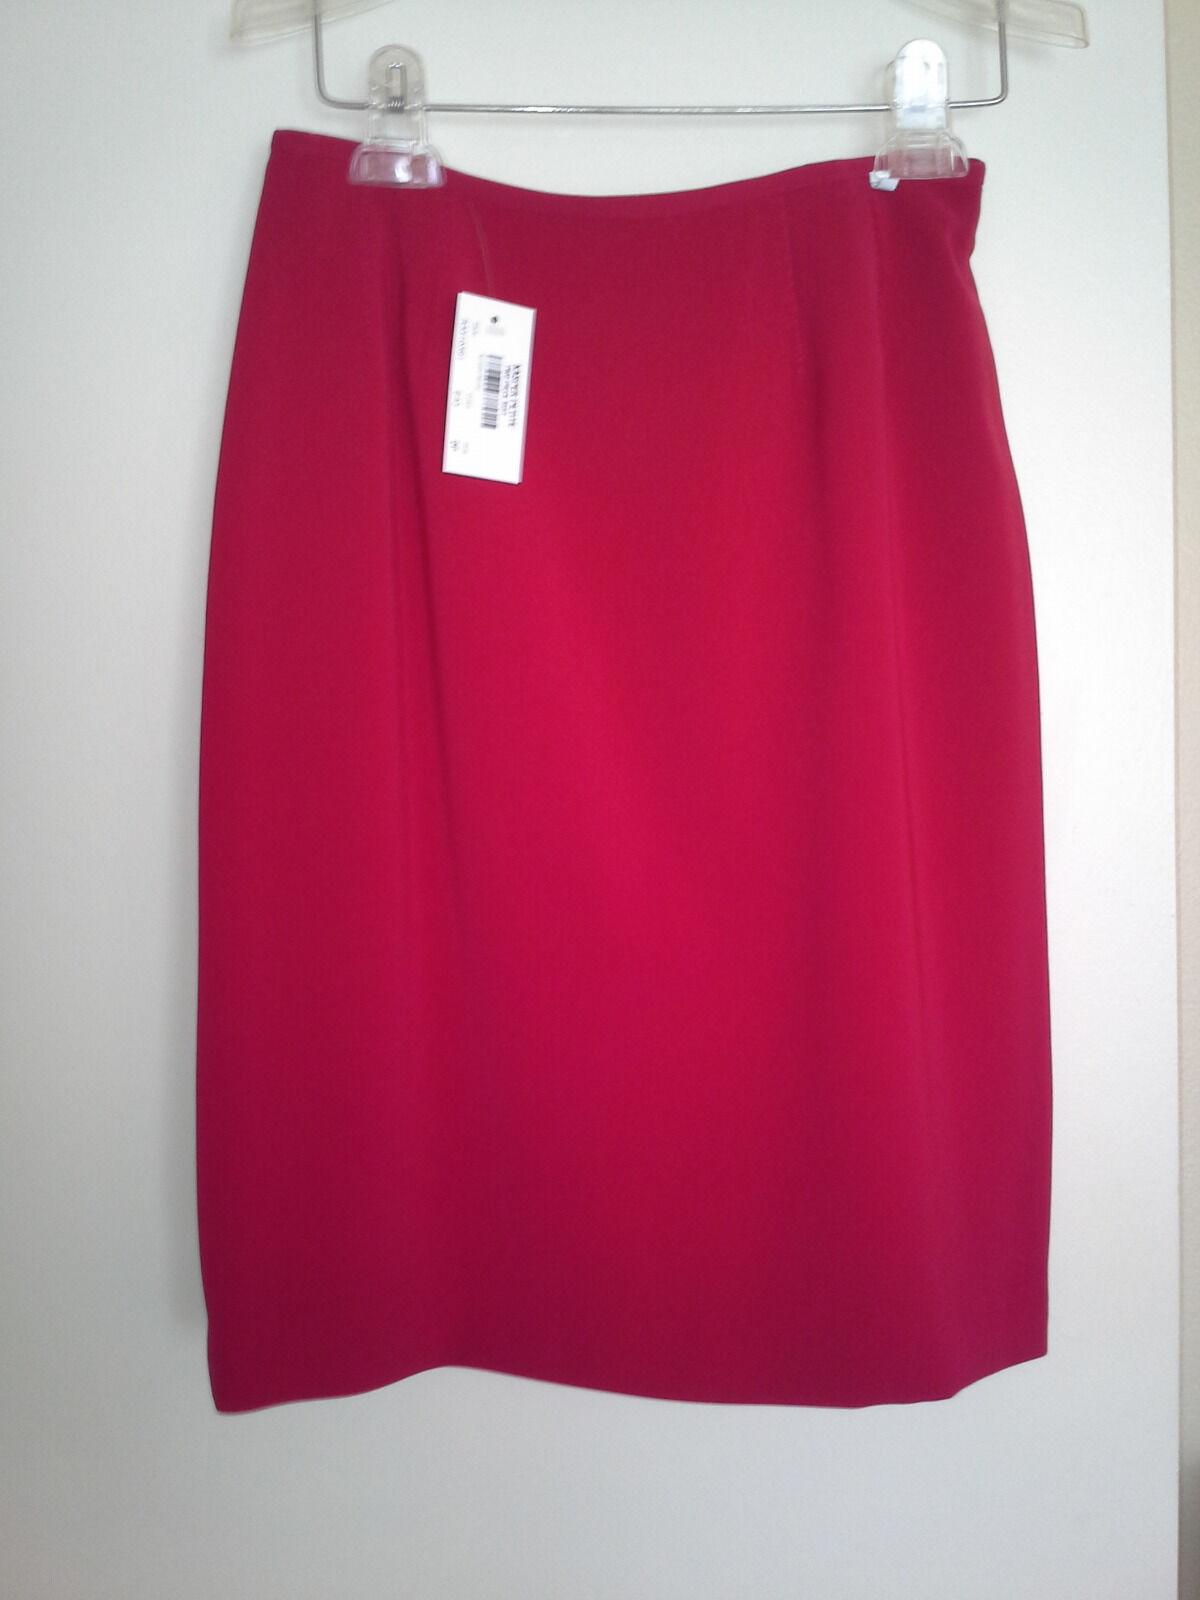 Suit, red, size 2, KASPER new.   skirt waist 27